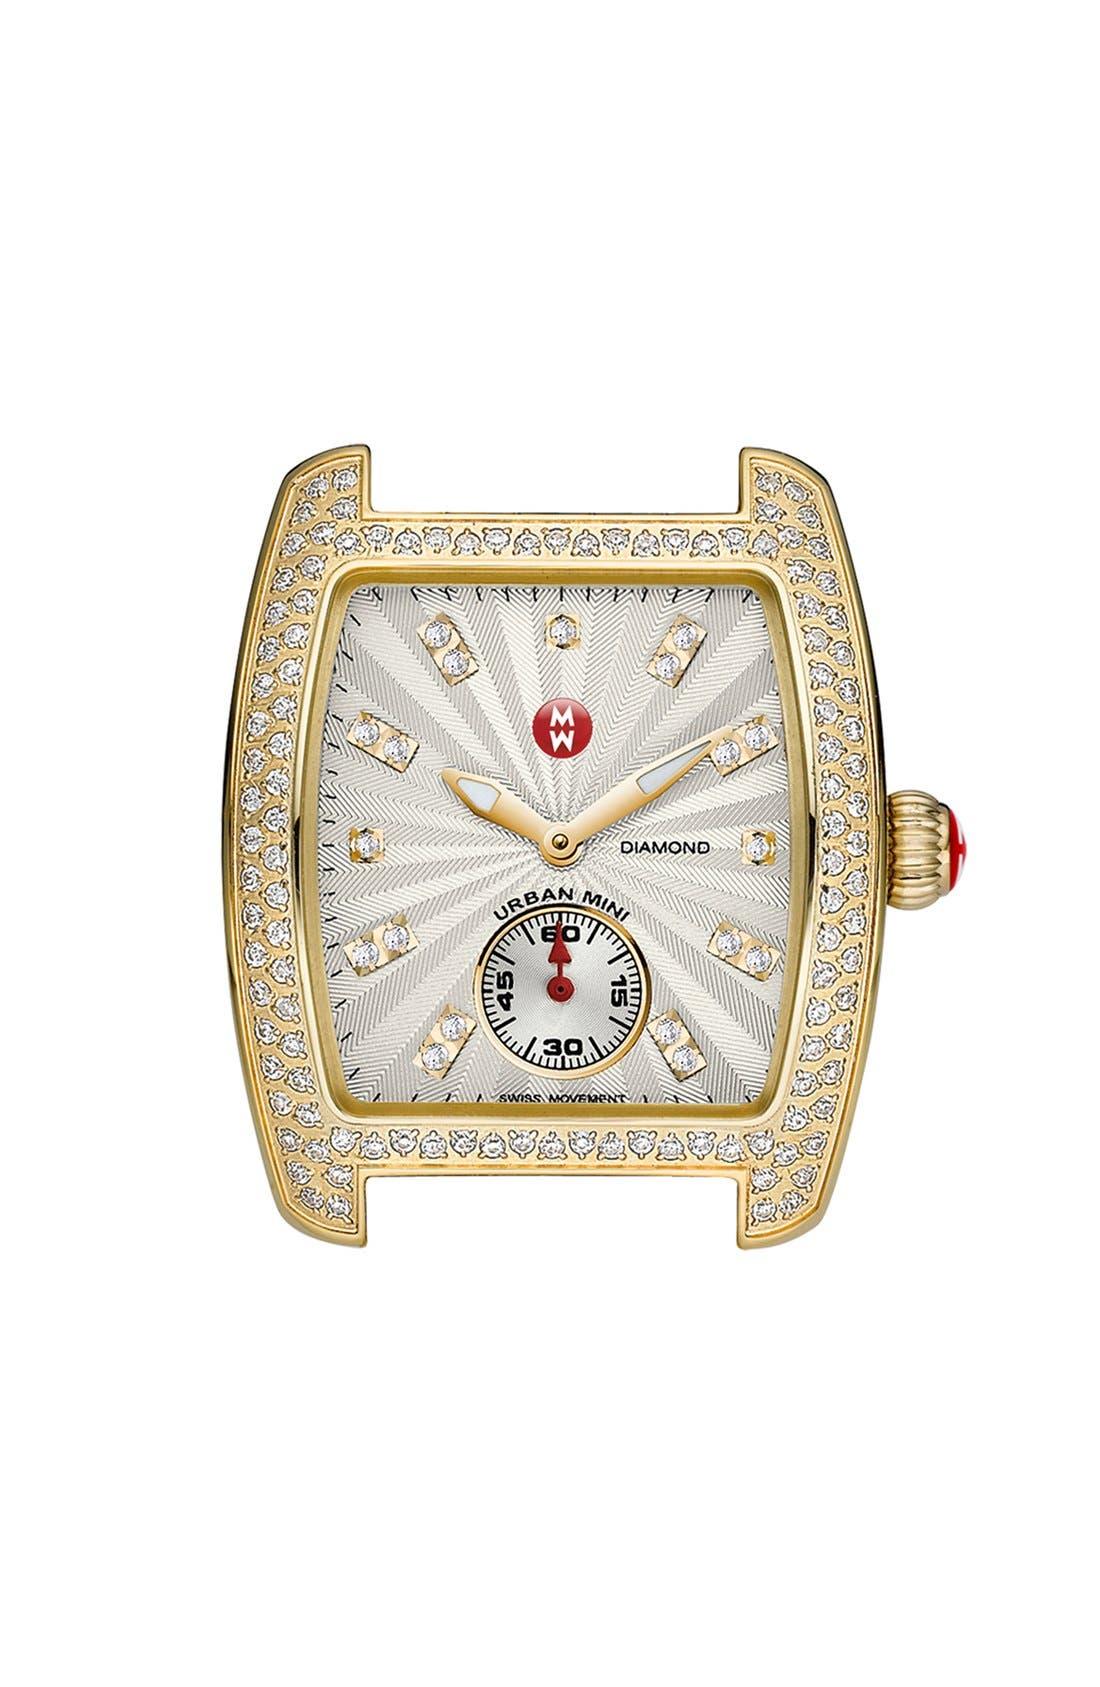 Alternate Image 1 Selected - MICHELE 'Urban Mini Diamond' Diamond Dial Watch Case, 29mm x 30mm